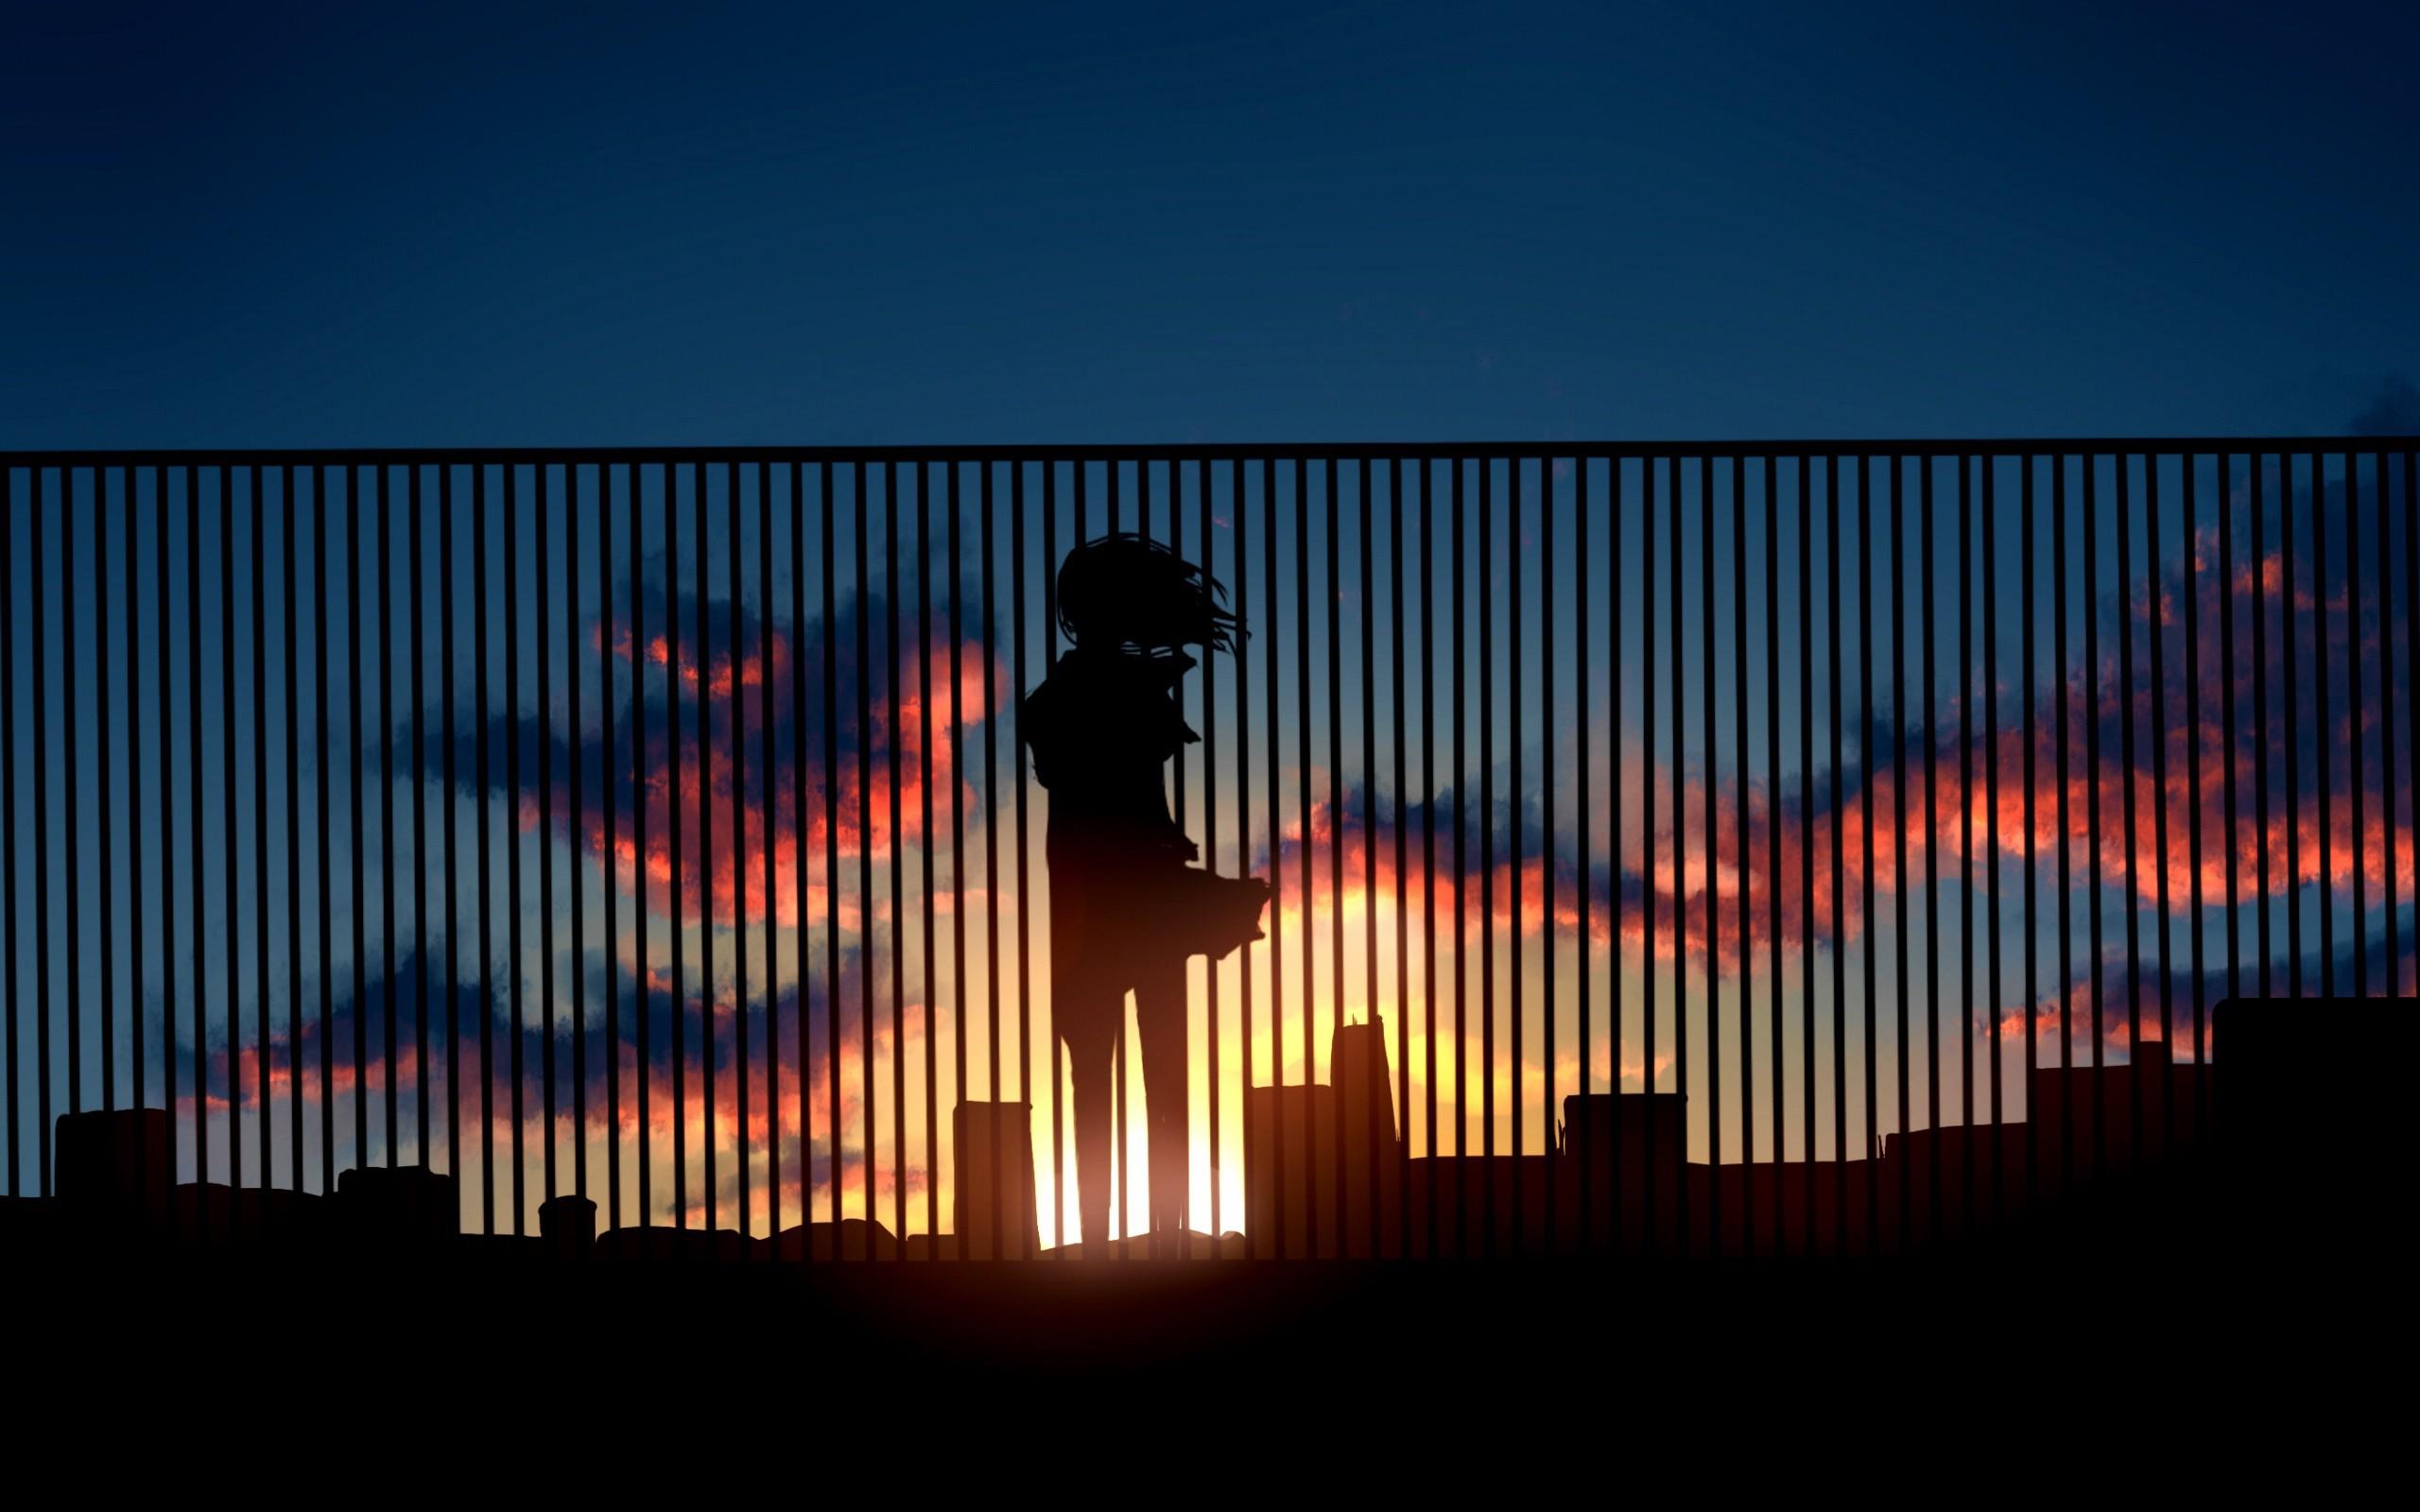 Alone Metro Sunset HD wallpaper